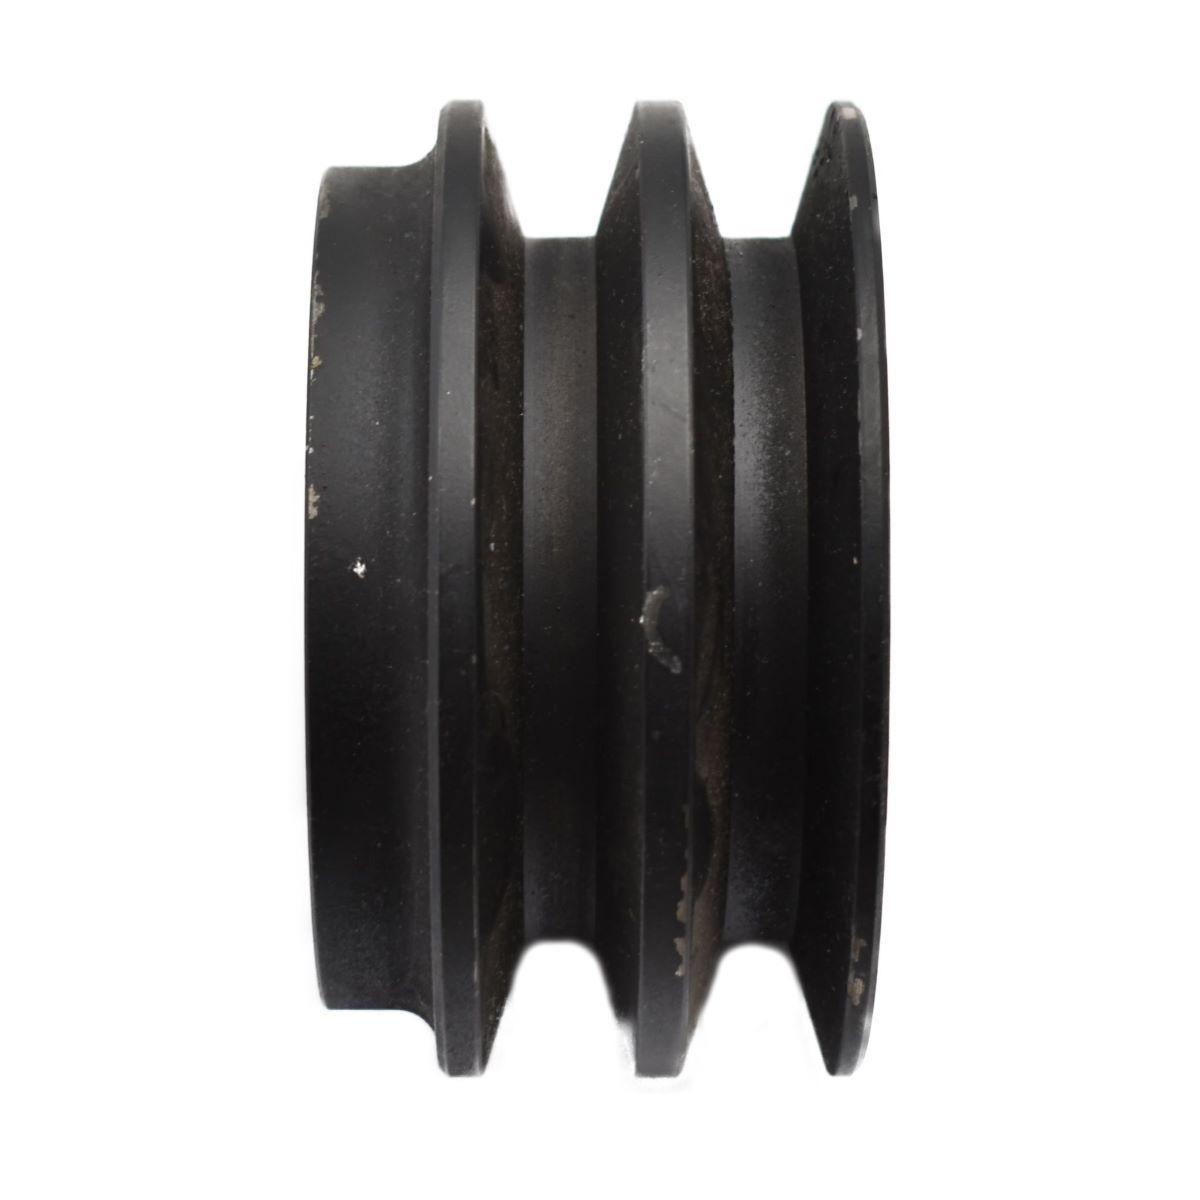 FRONT PTO POELIE ISEKI Origineel onderdeel nummer: F2-003-00 F200300 Betreft origineel Iseki onderdeel! Afmetingen: Diameter: 110mm Hoogte: 57mm